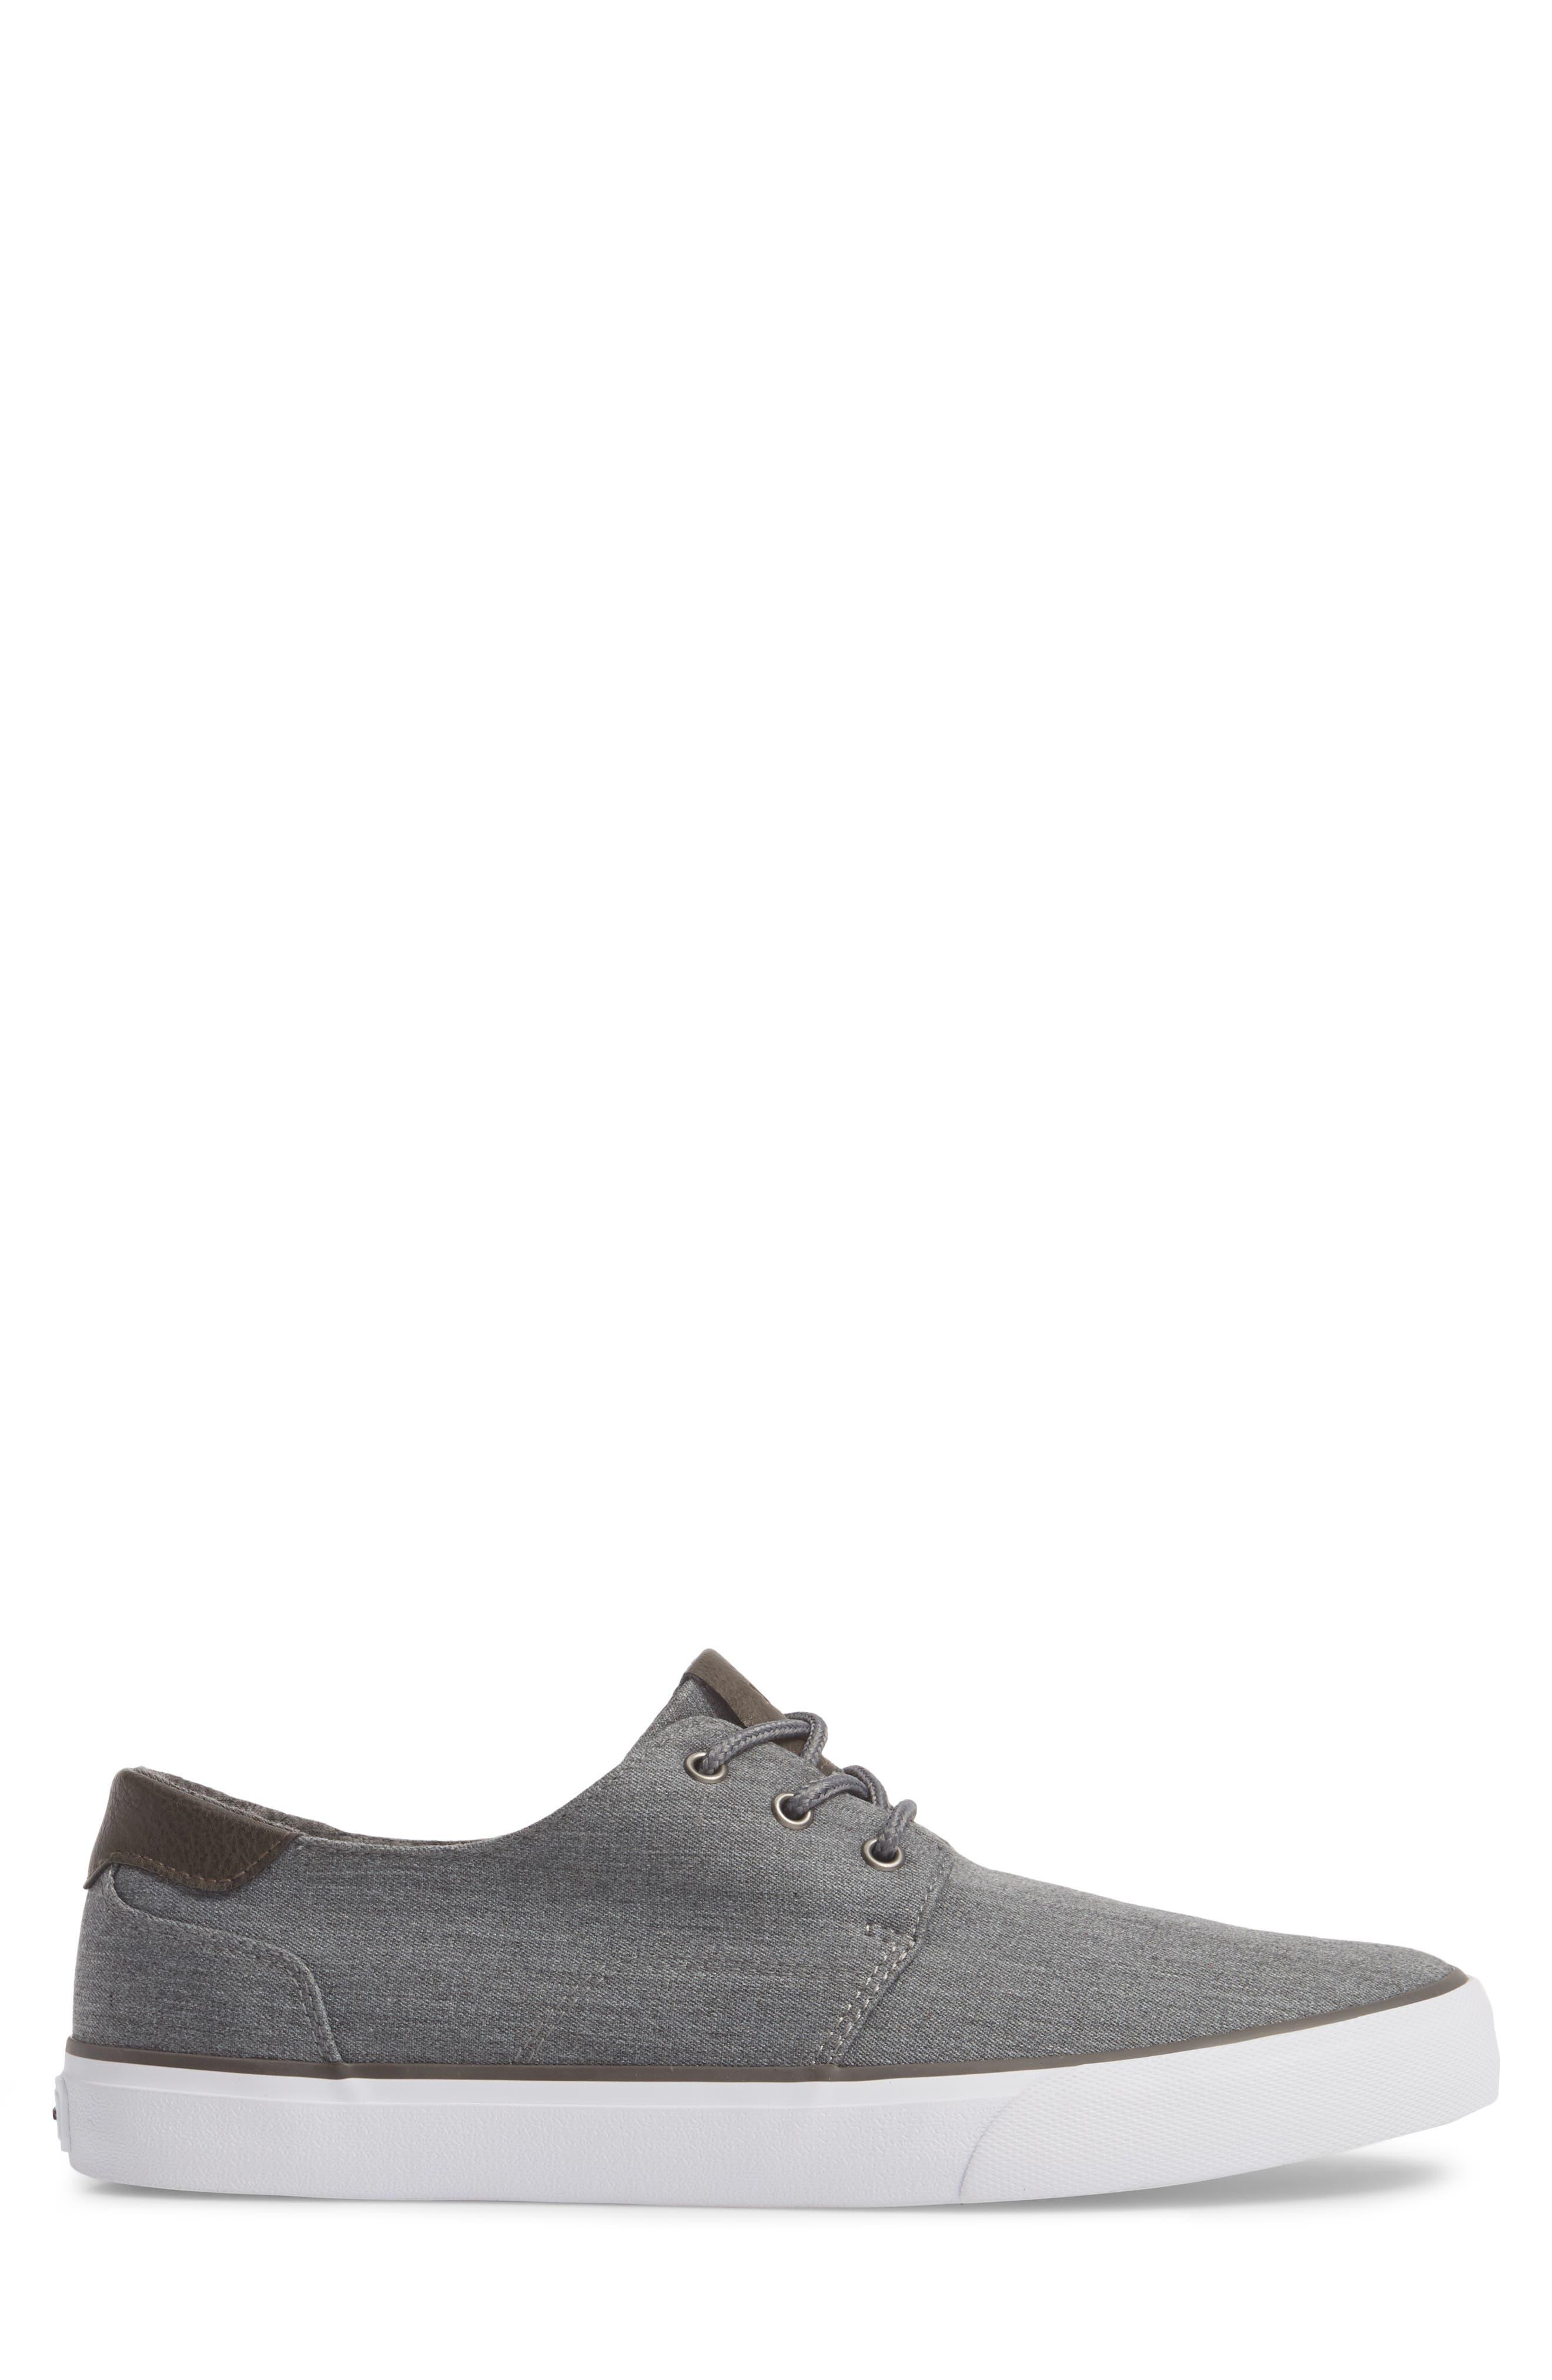 Briggs Low Top Sneaker,                             Alternate thumbnail 3, color,                             CHARCOAL/ DARK GREY/ WHITE